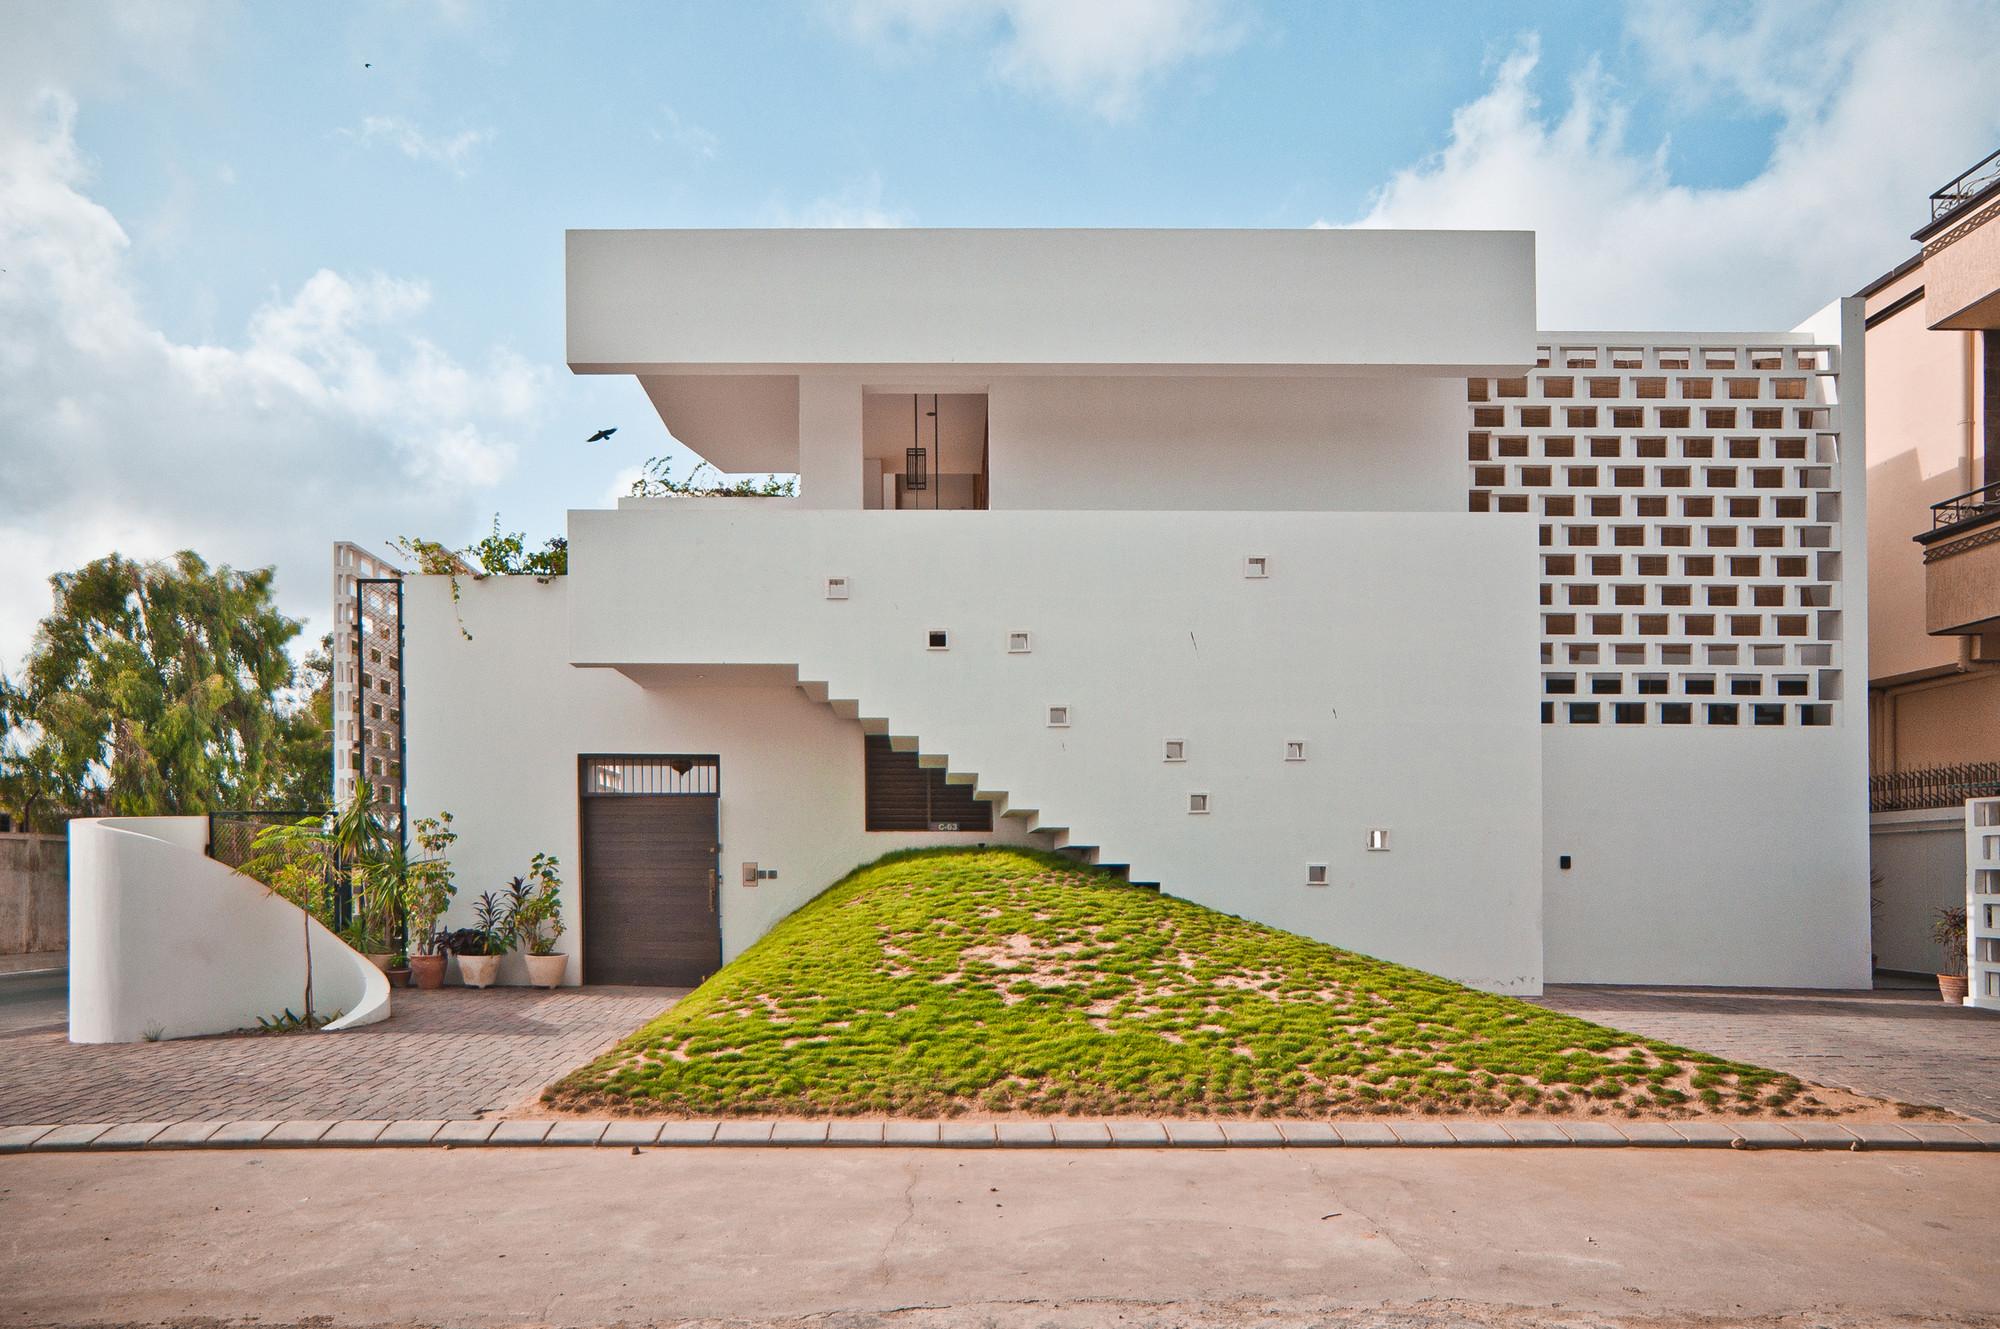 Kapadia Residence / Coalesce Design Studio, © Mustafa Mehdi